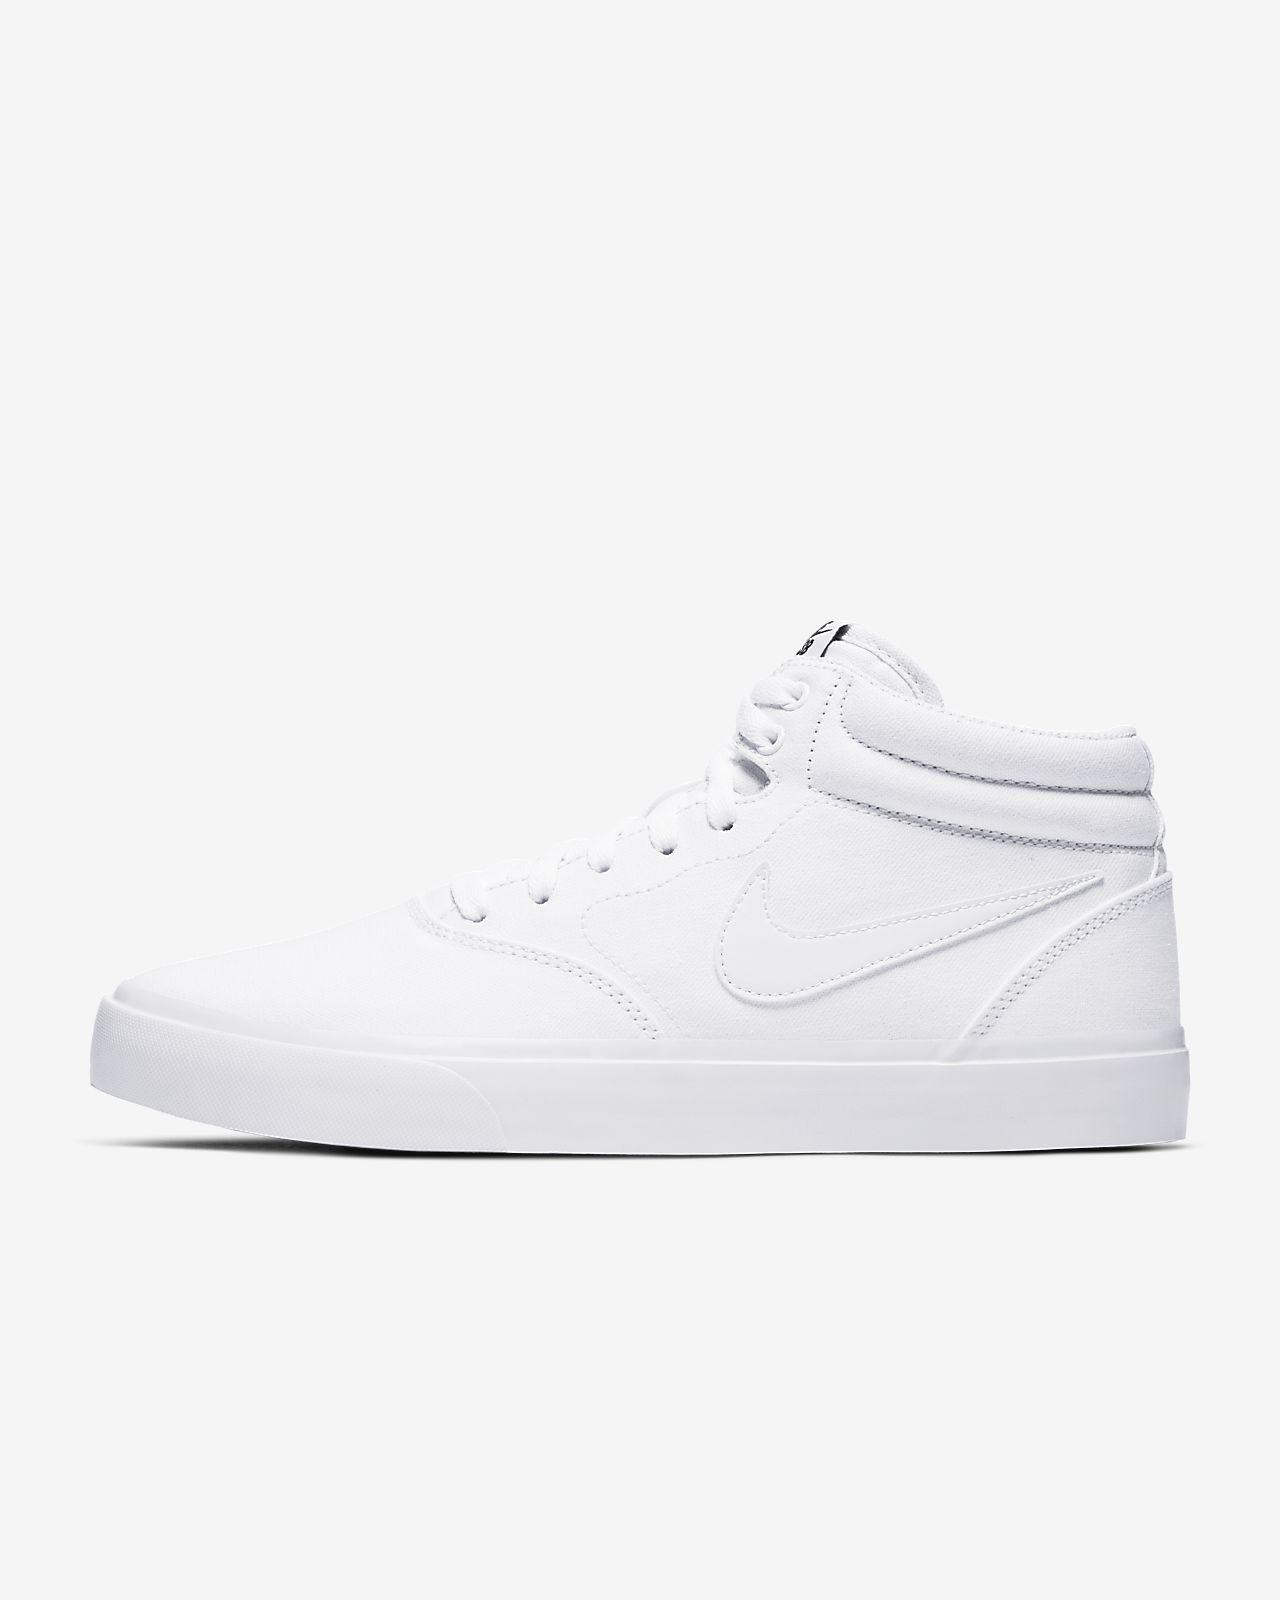 Nike SB Charge Mid Canvas Skate Shoe